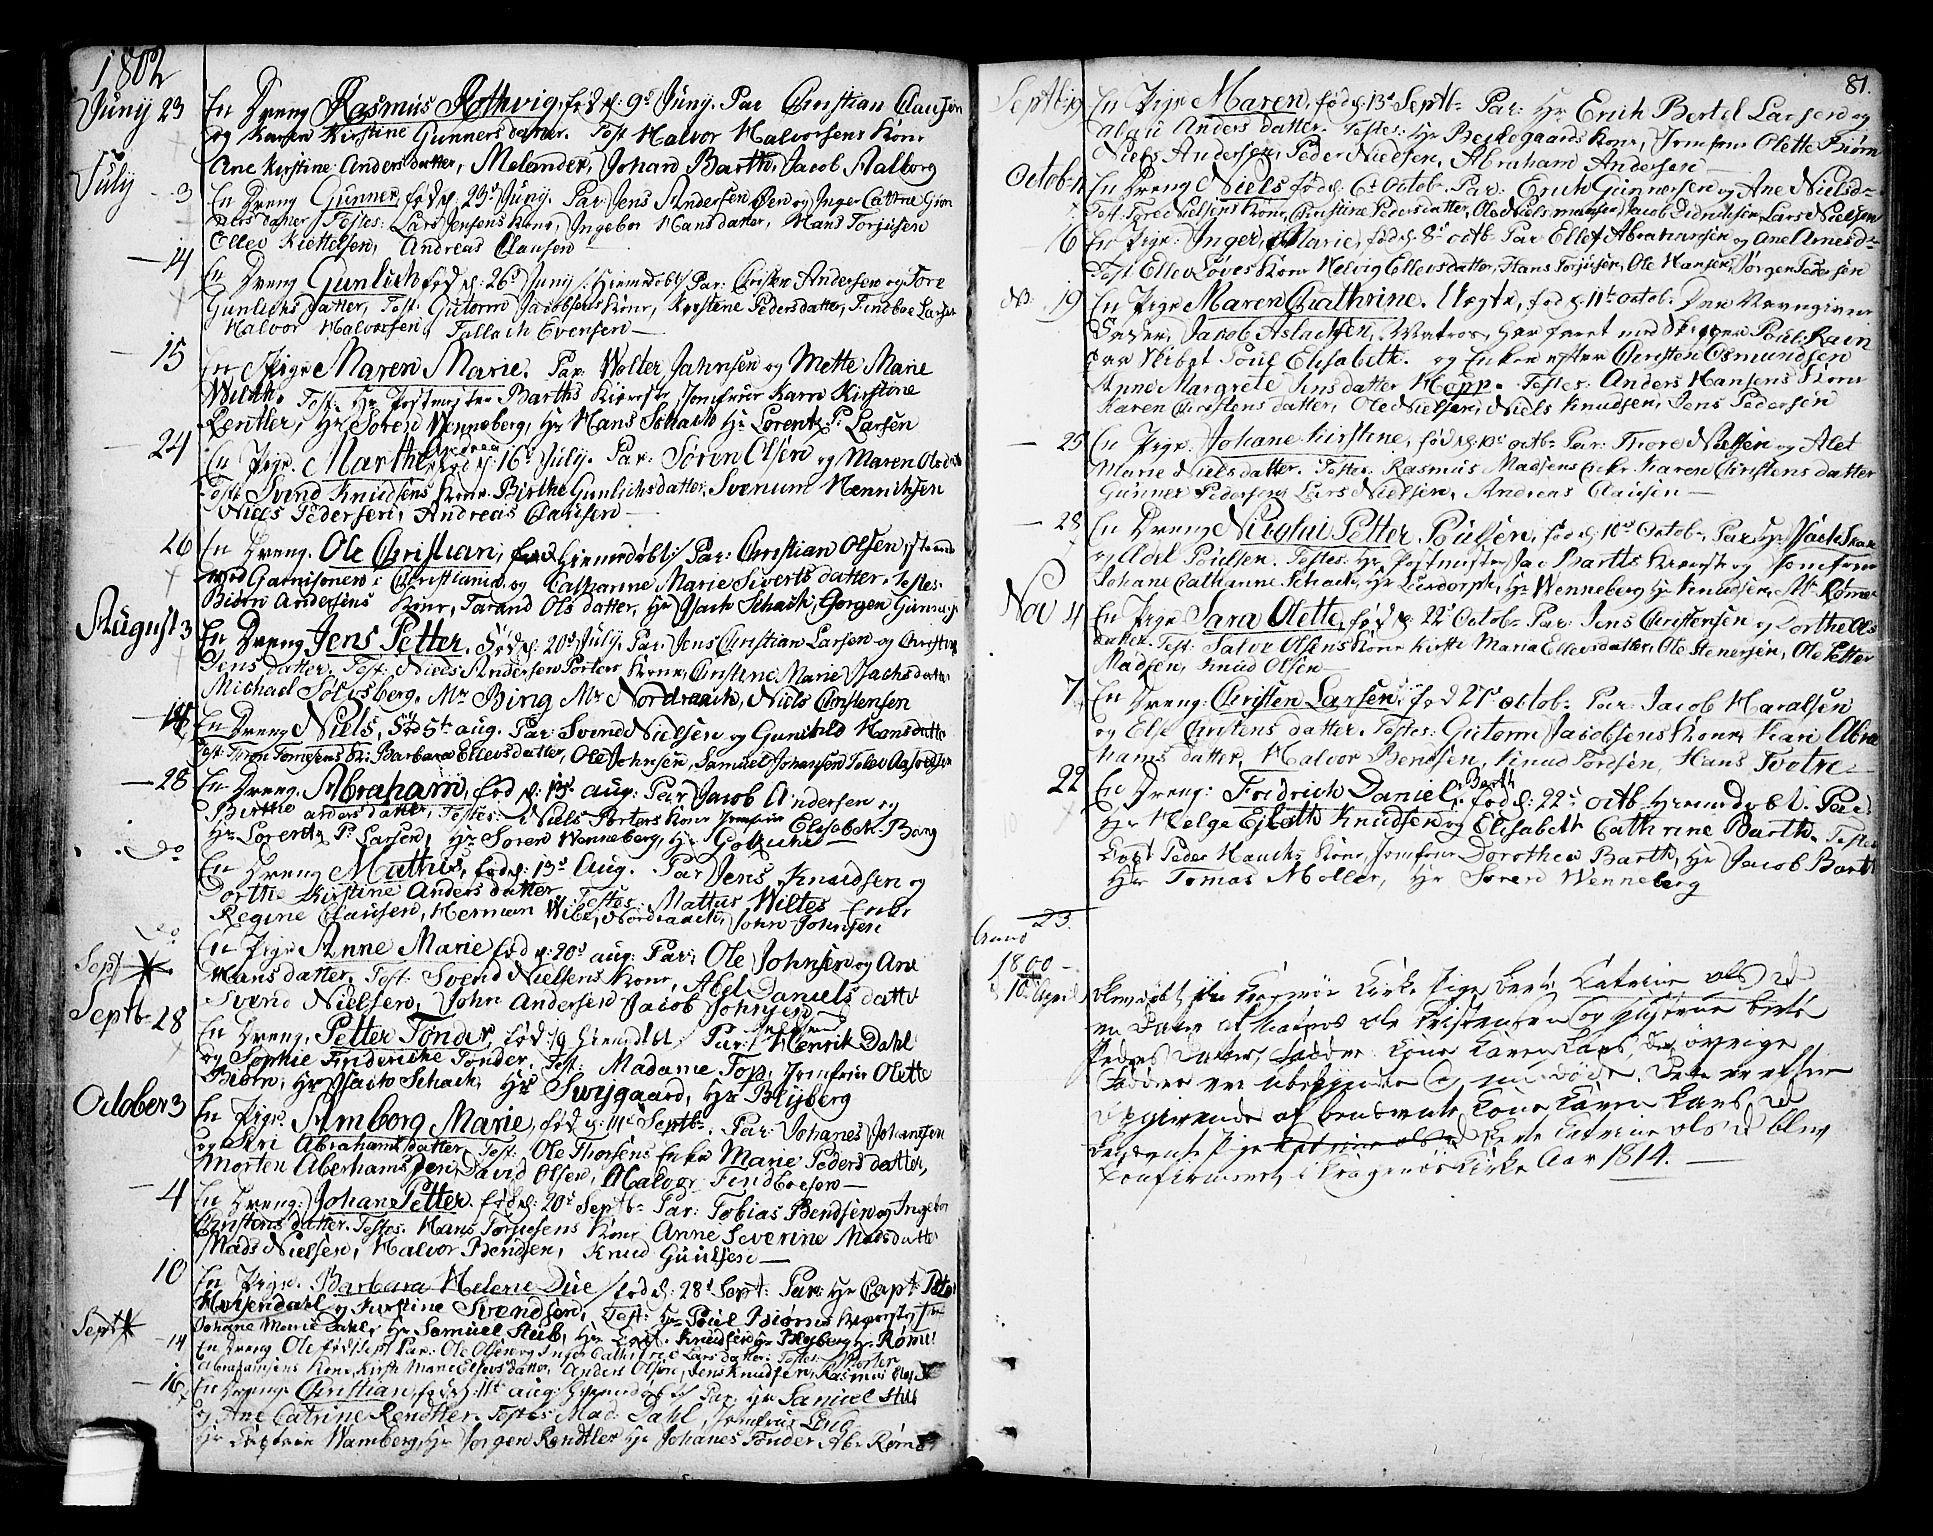 SAKO, Kragerø kirkebøker, F/Fa/L0002: Ministerialbok nr. 2, 1767-1802, s. 81